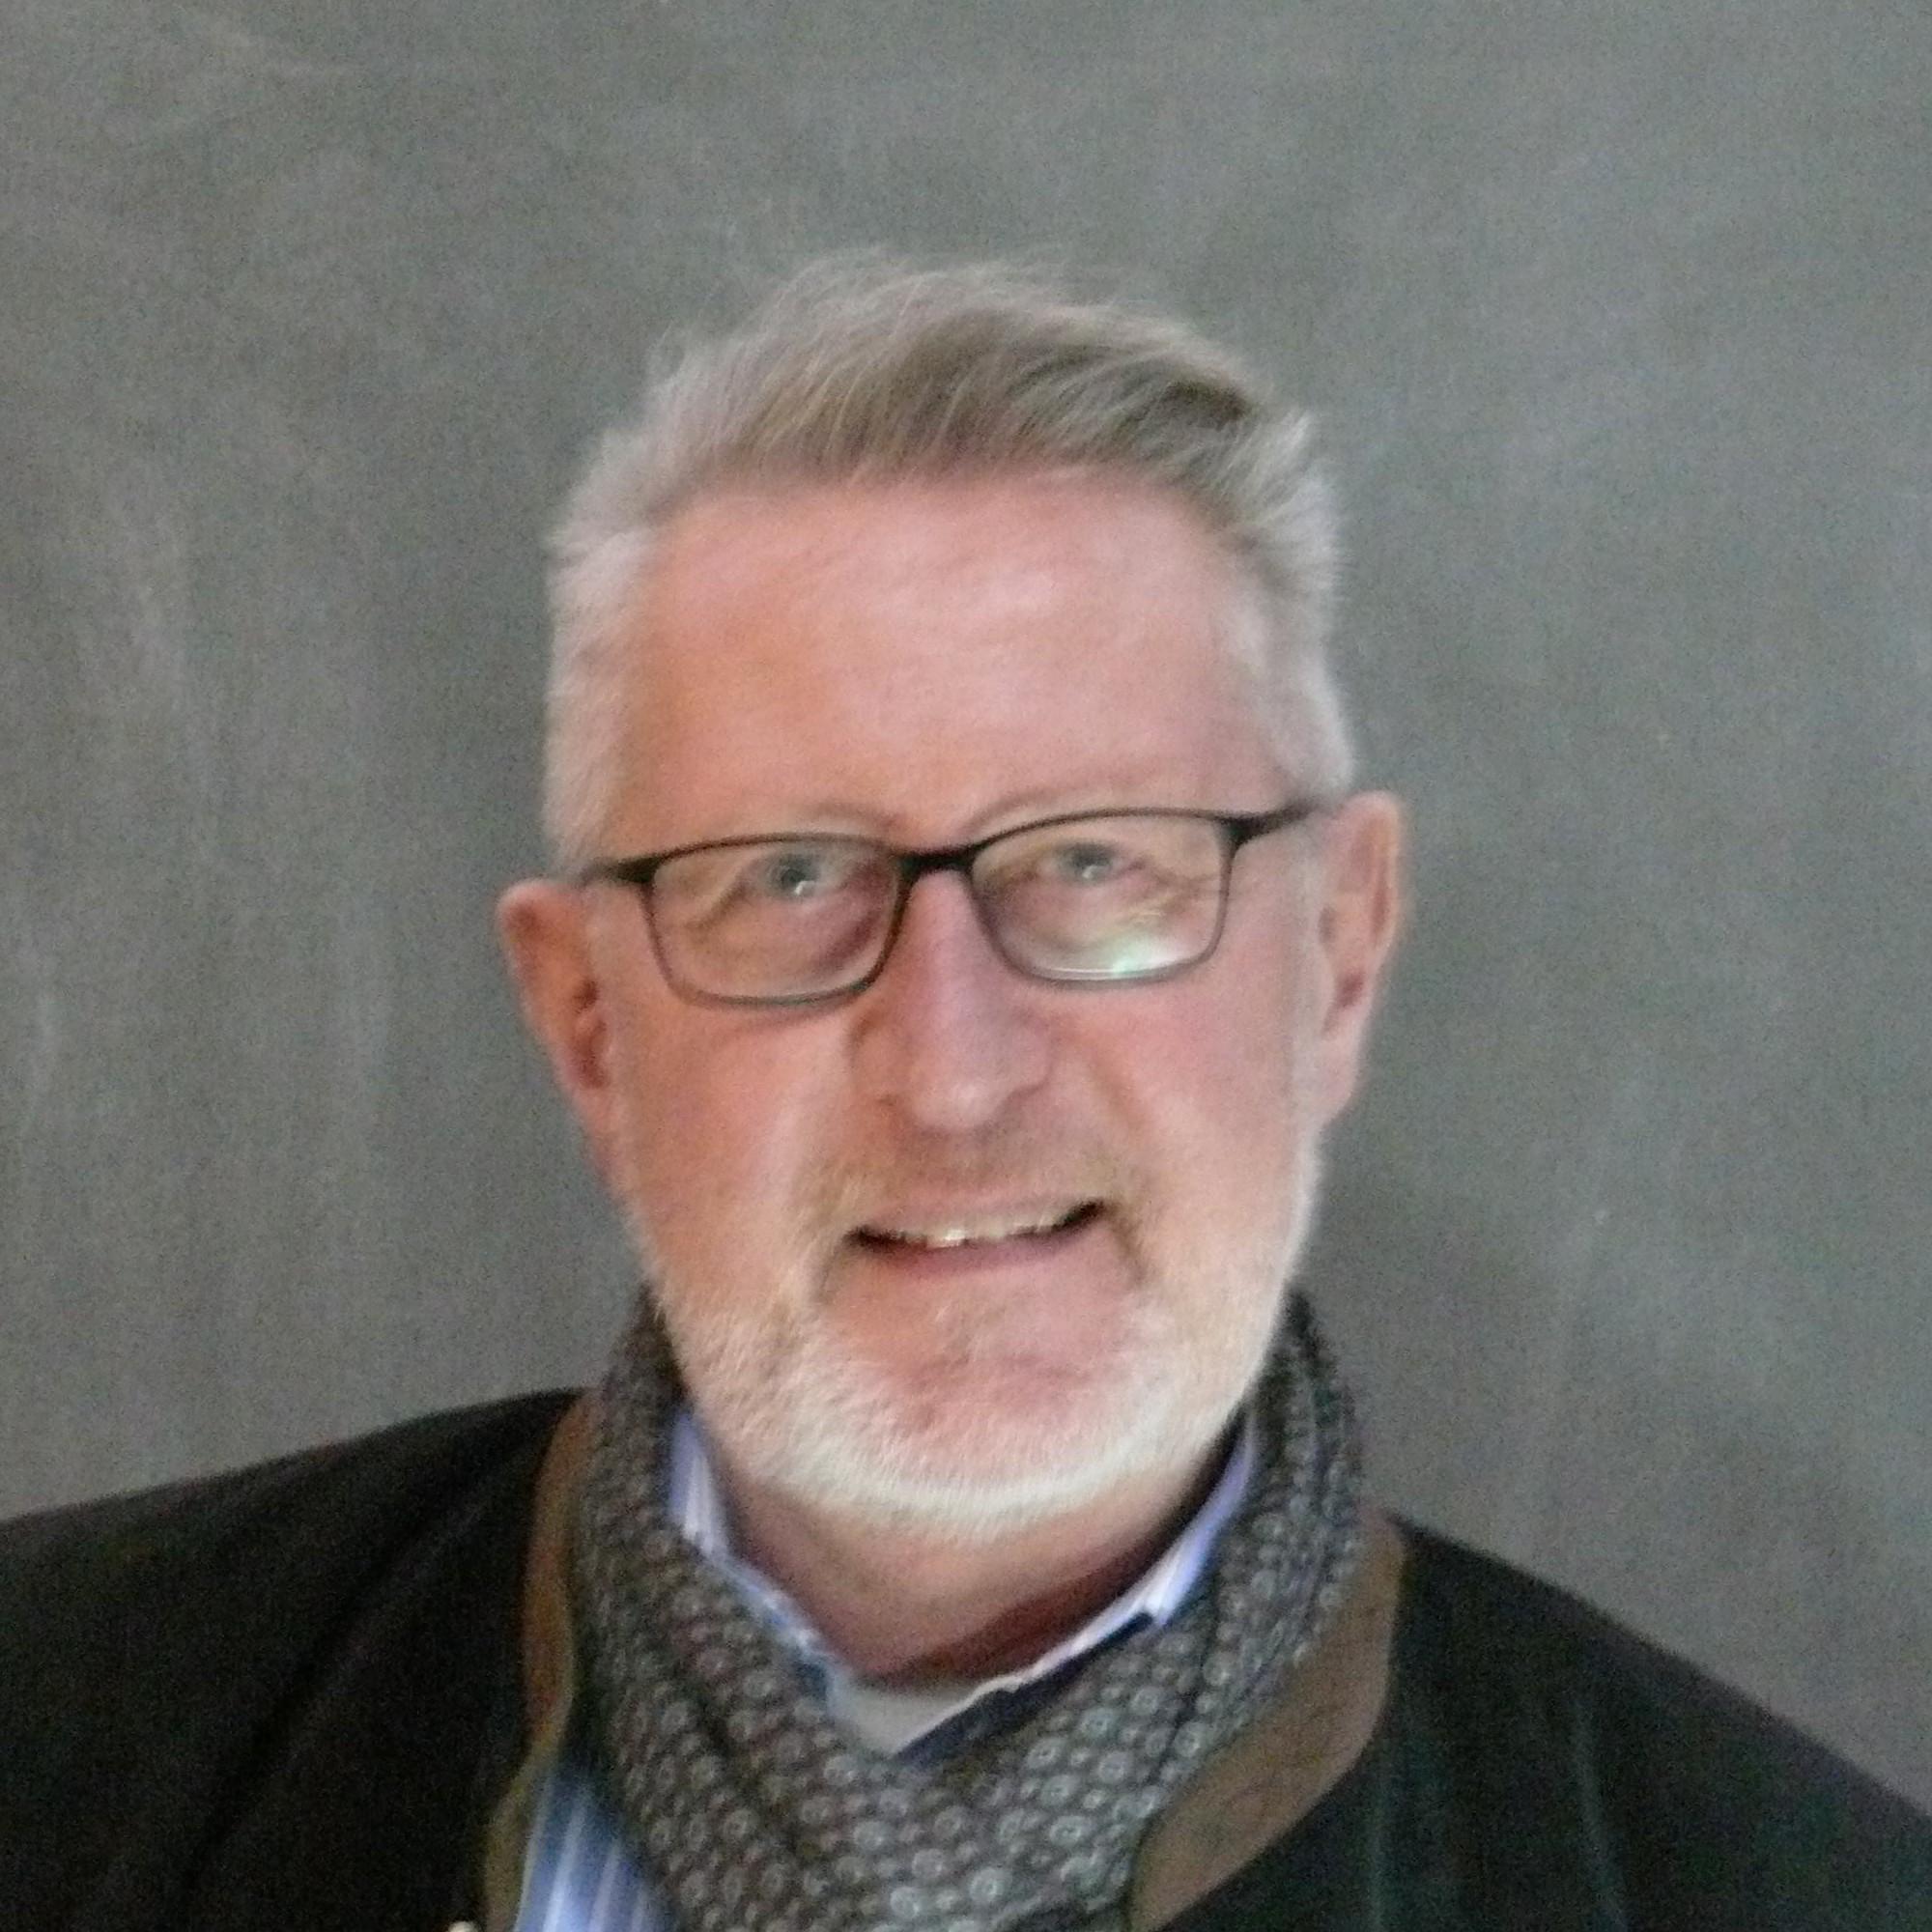 Frank Lubowitz